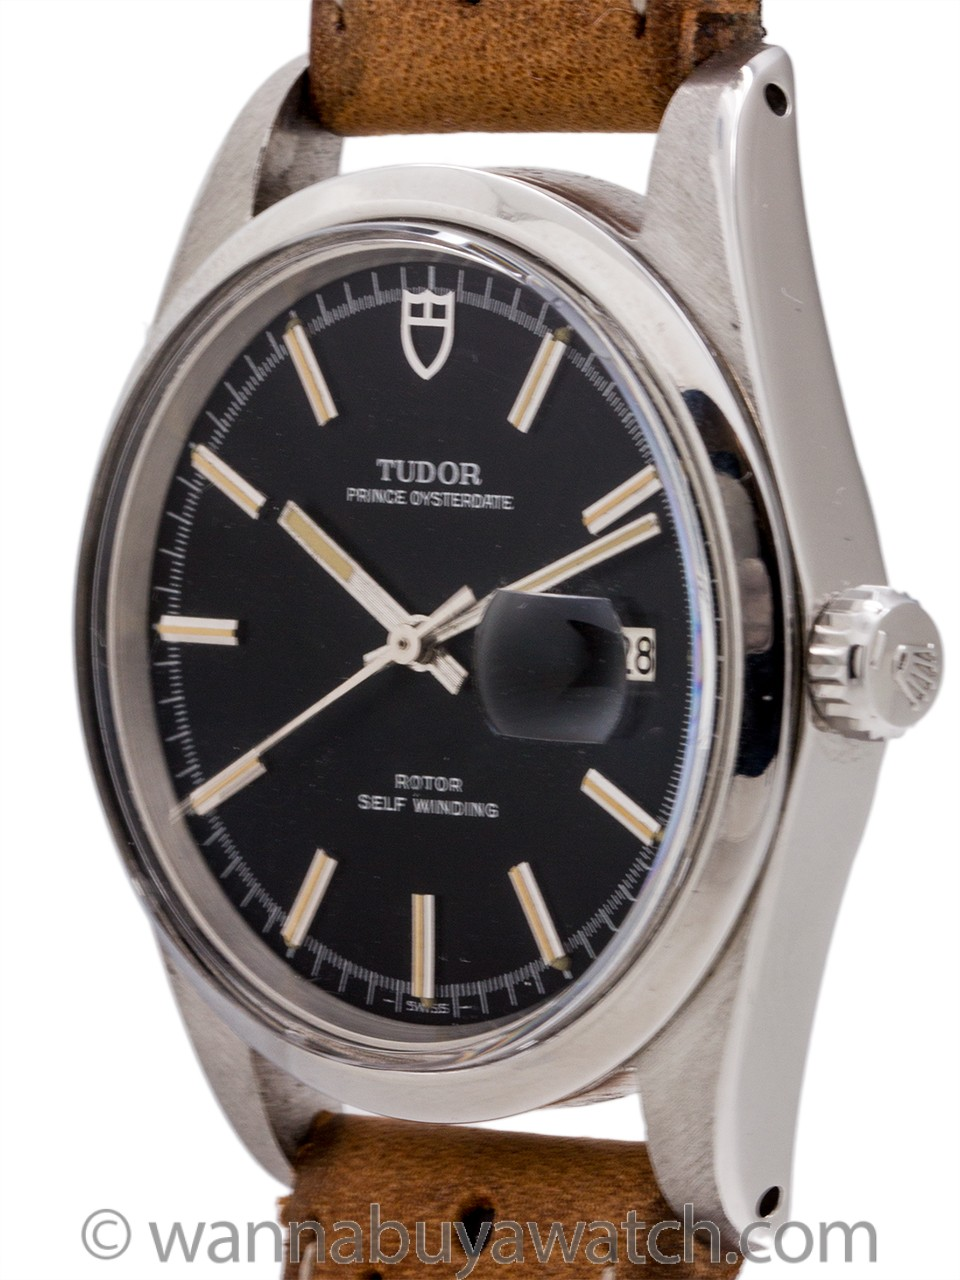 Tudor Prince Oysterdate ref# 90800 Jumbo circa 1978